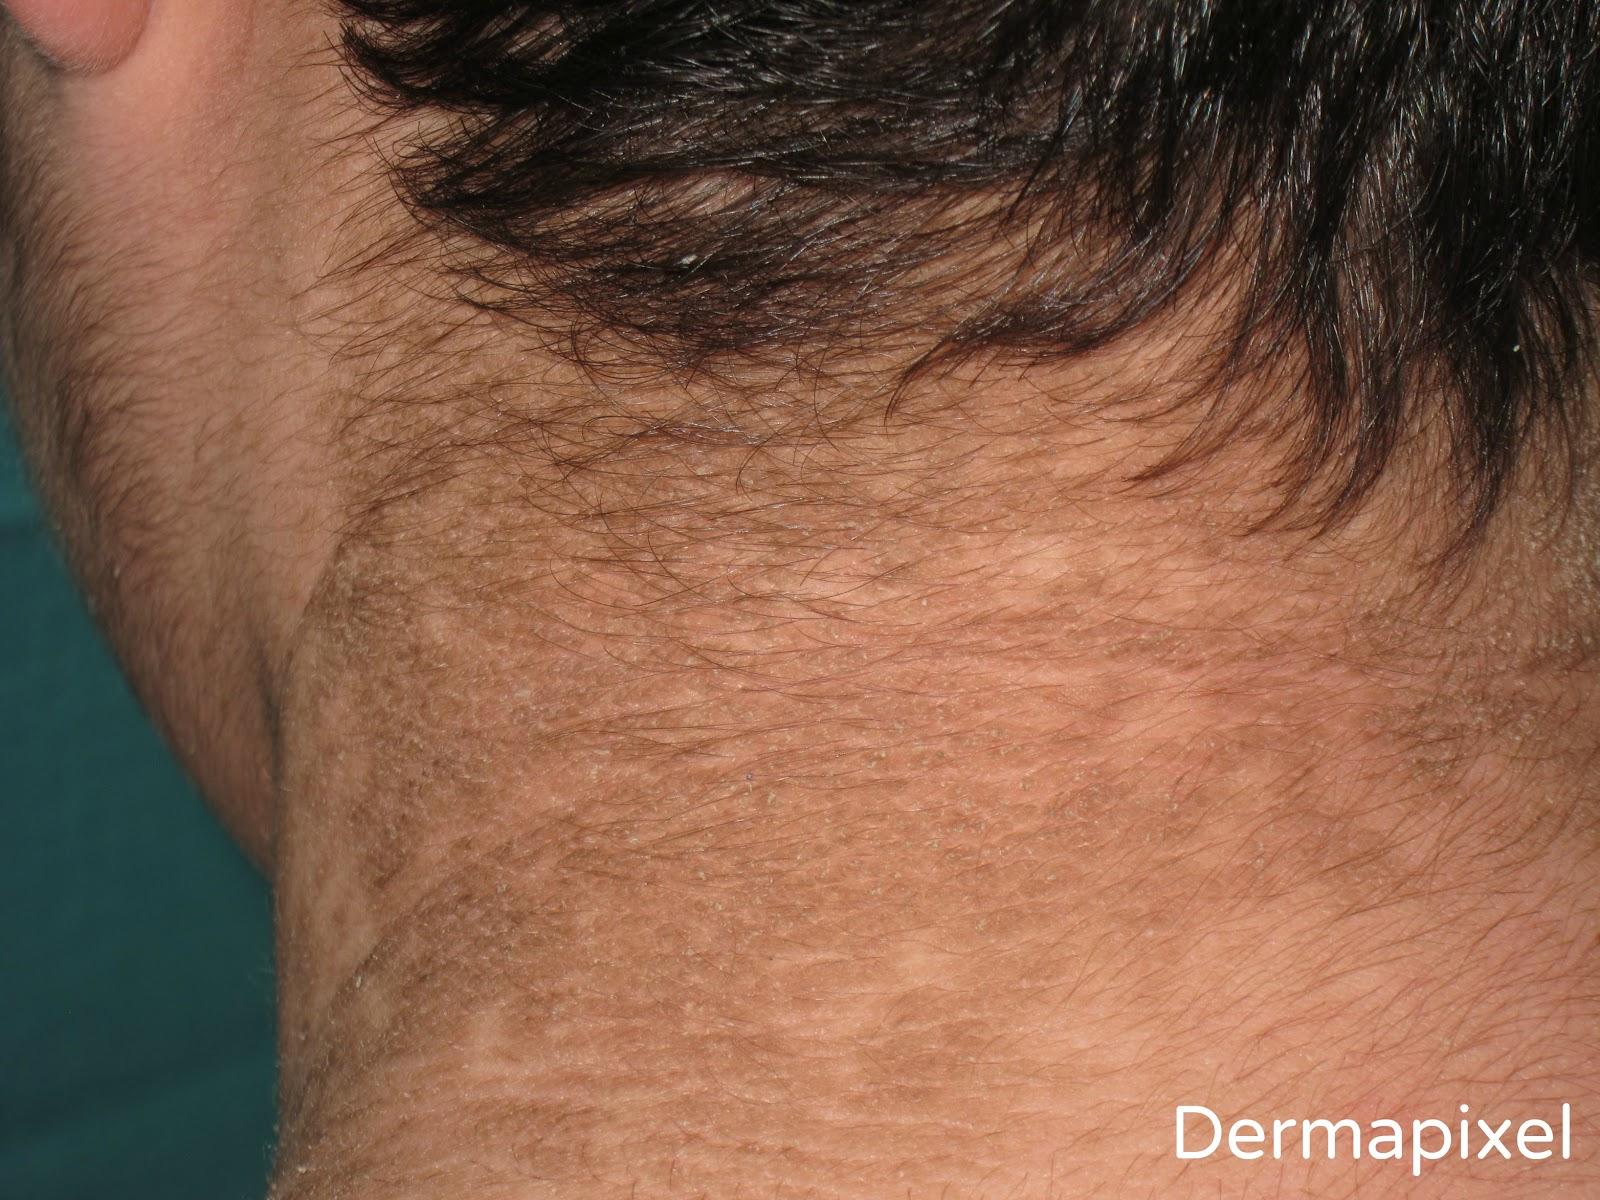 tratamiento para papilomatosis confluente y reticulada ovarian cancer prevalence